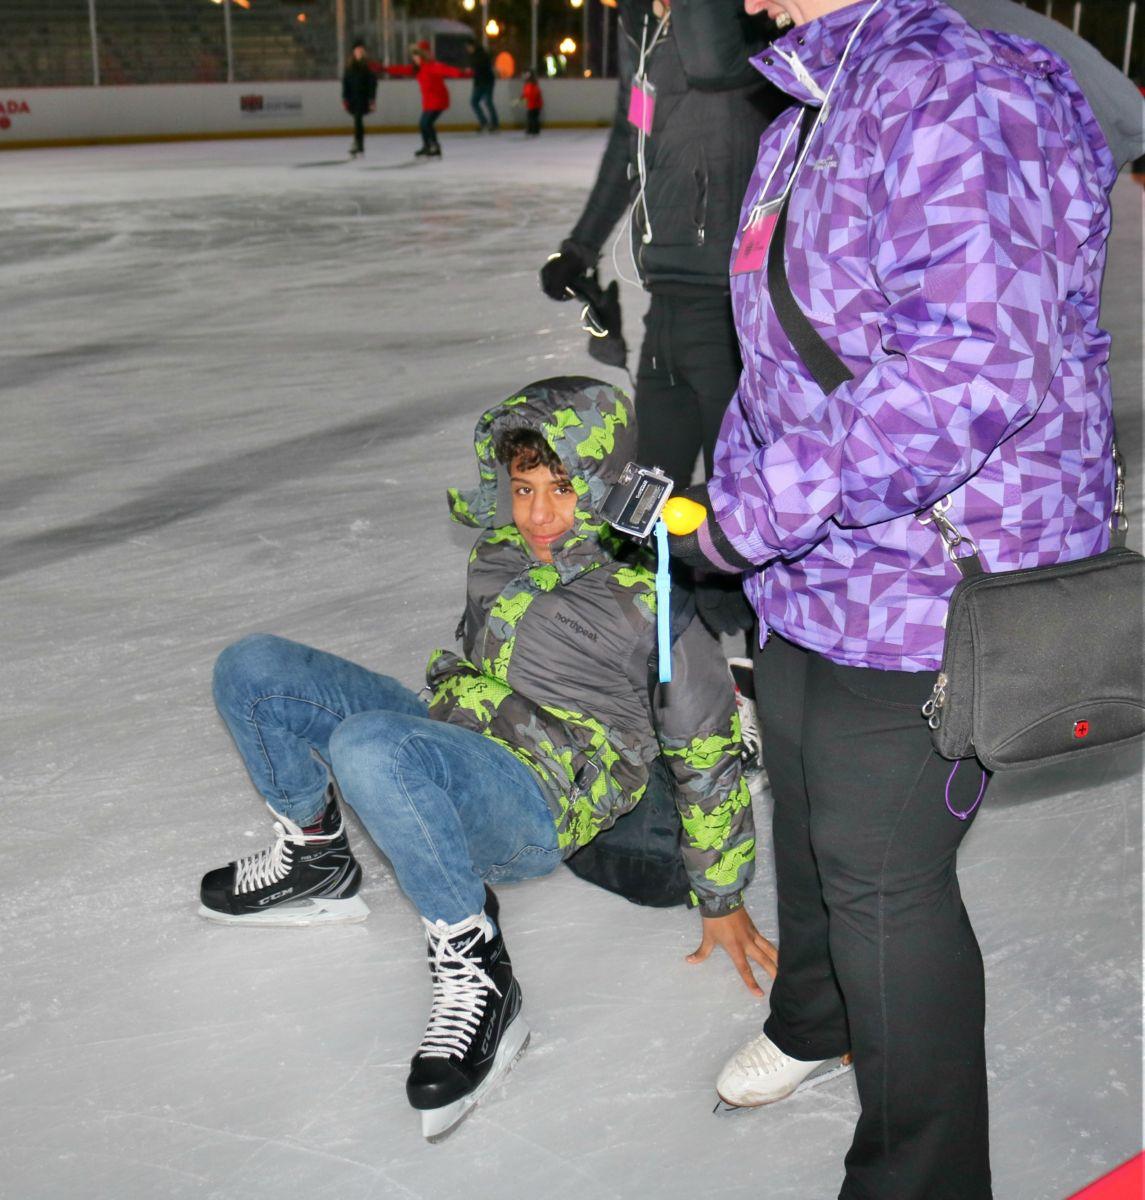 SkatingHill2